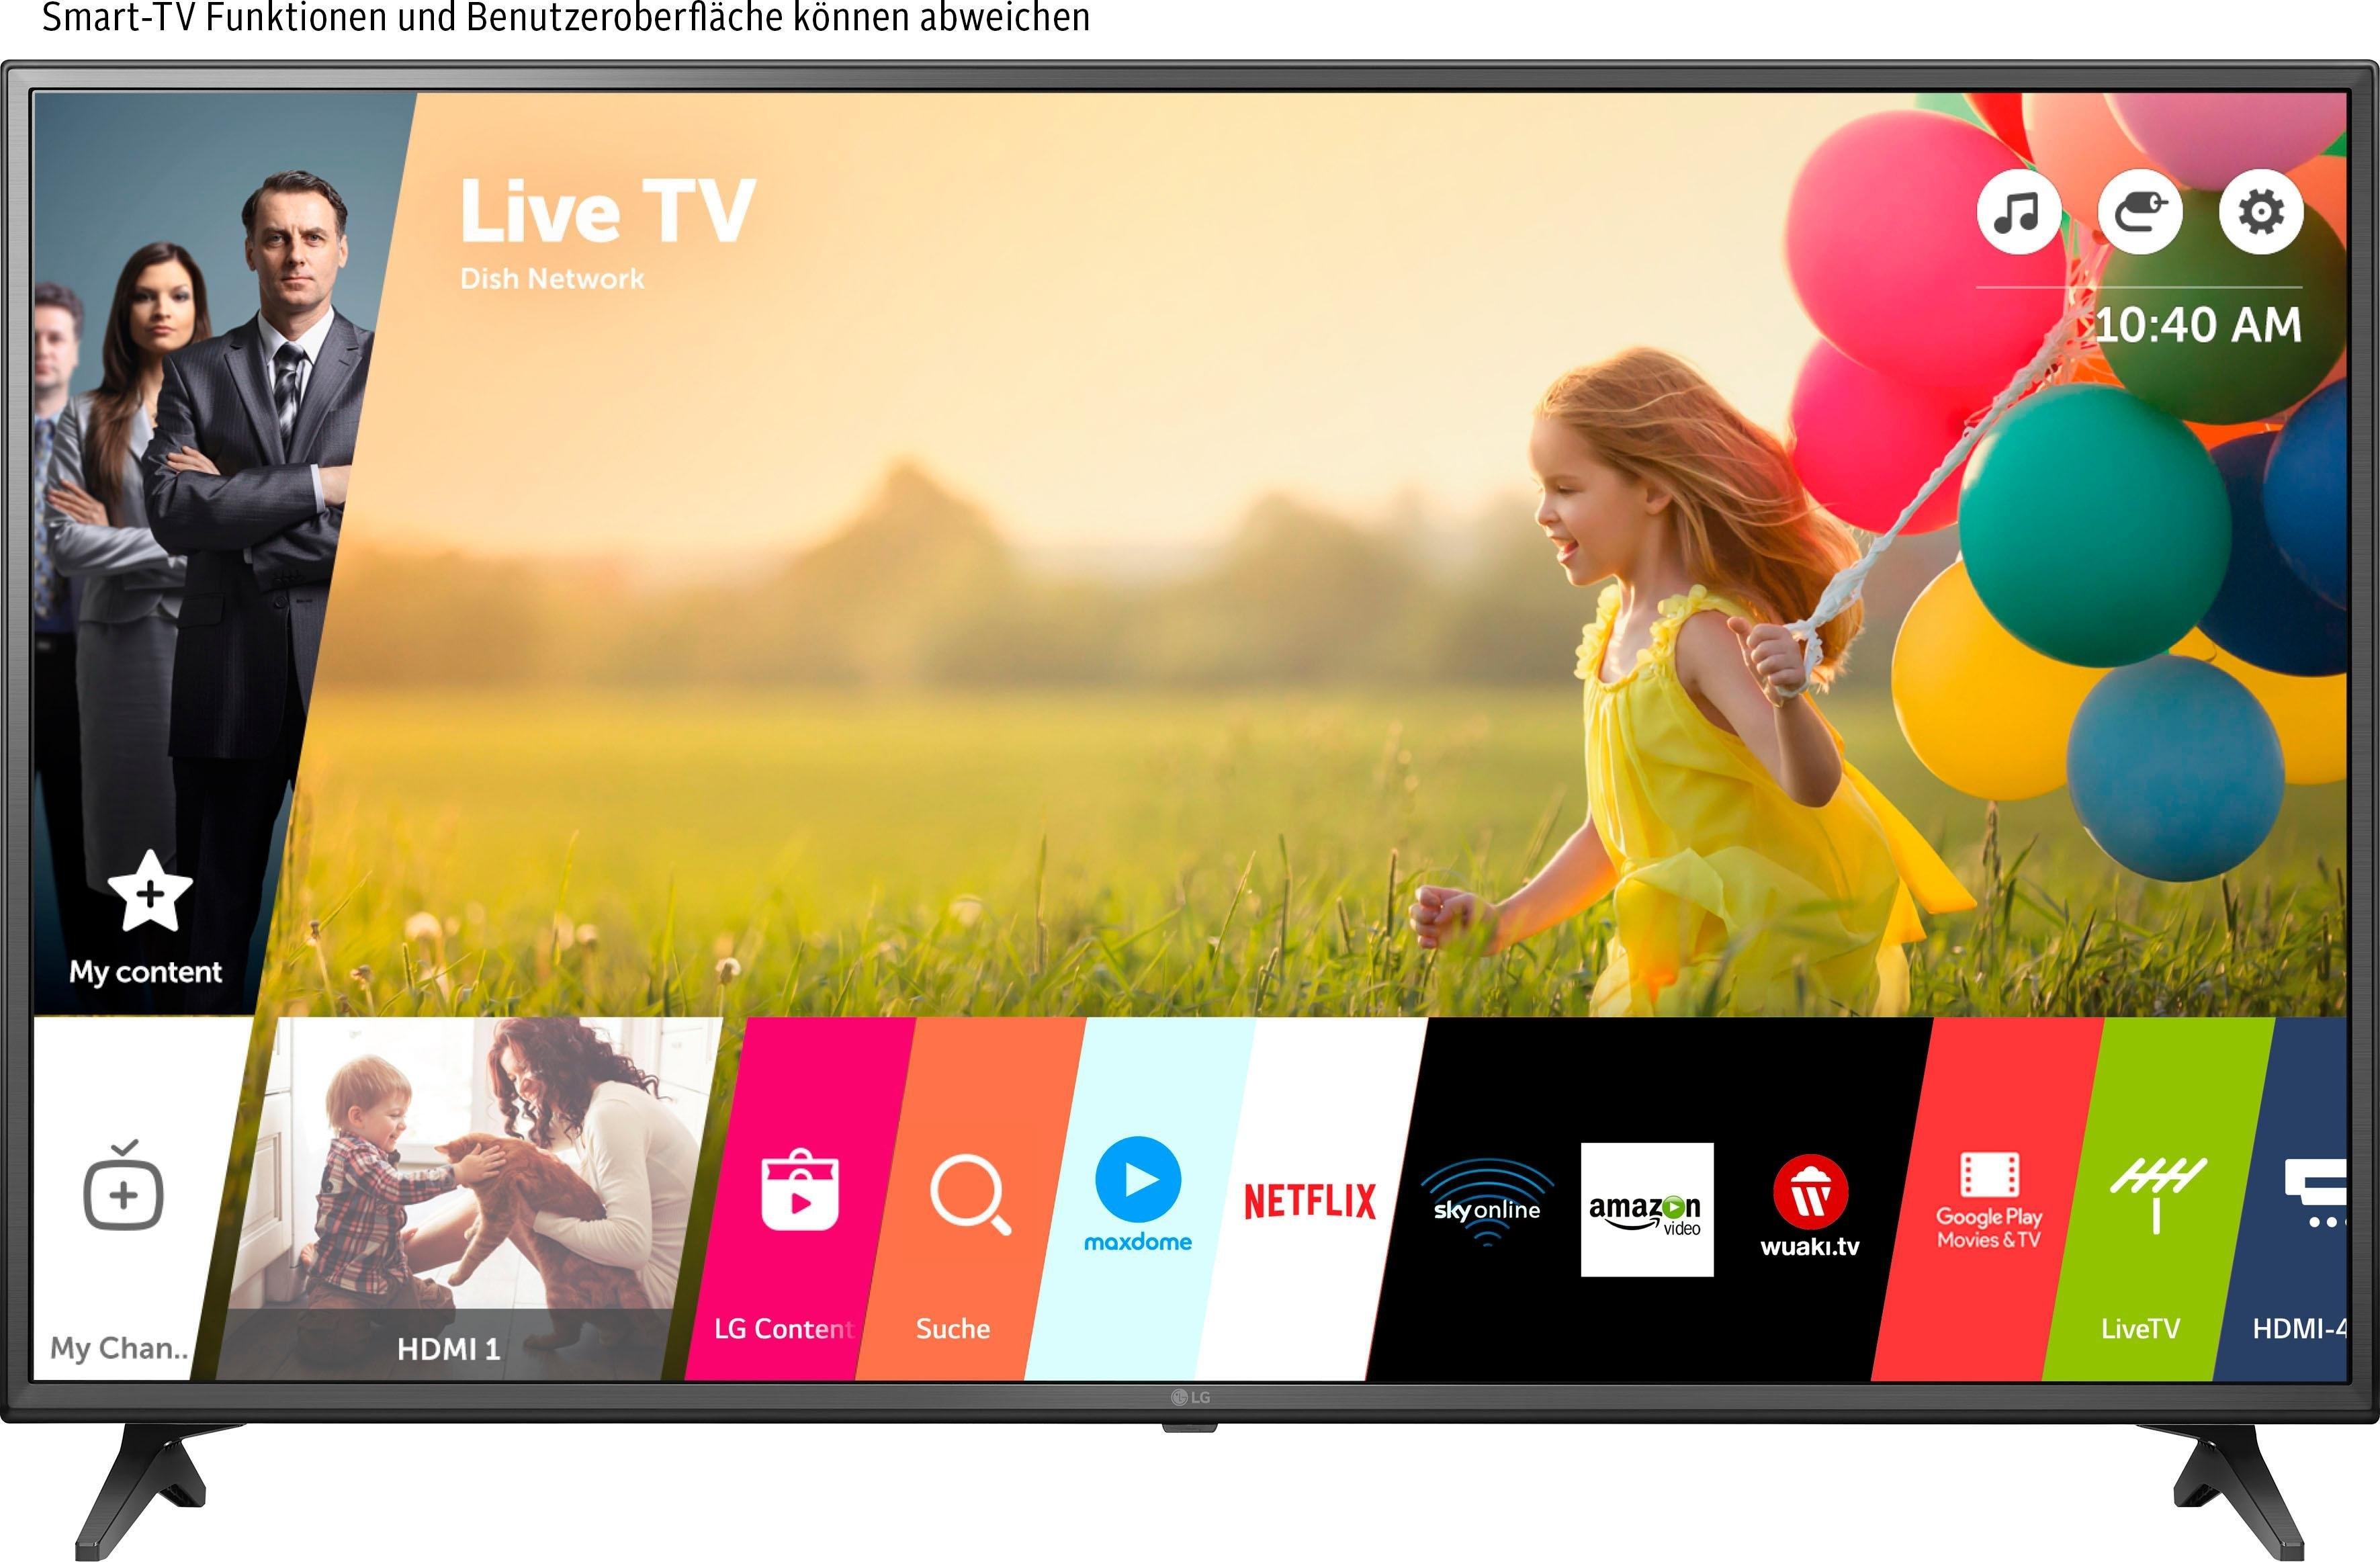 LG 55UM7050PLC LED-televisie (139 cm / (55 Inch), 4K Ultra HD, Smart-TV bestellen: 30 dagen bedenktijd